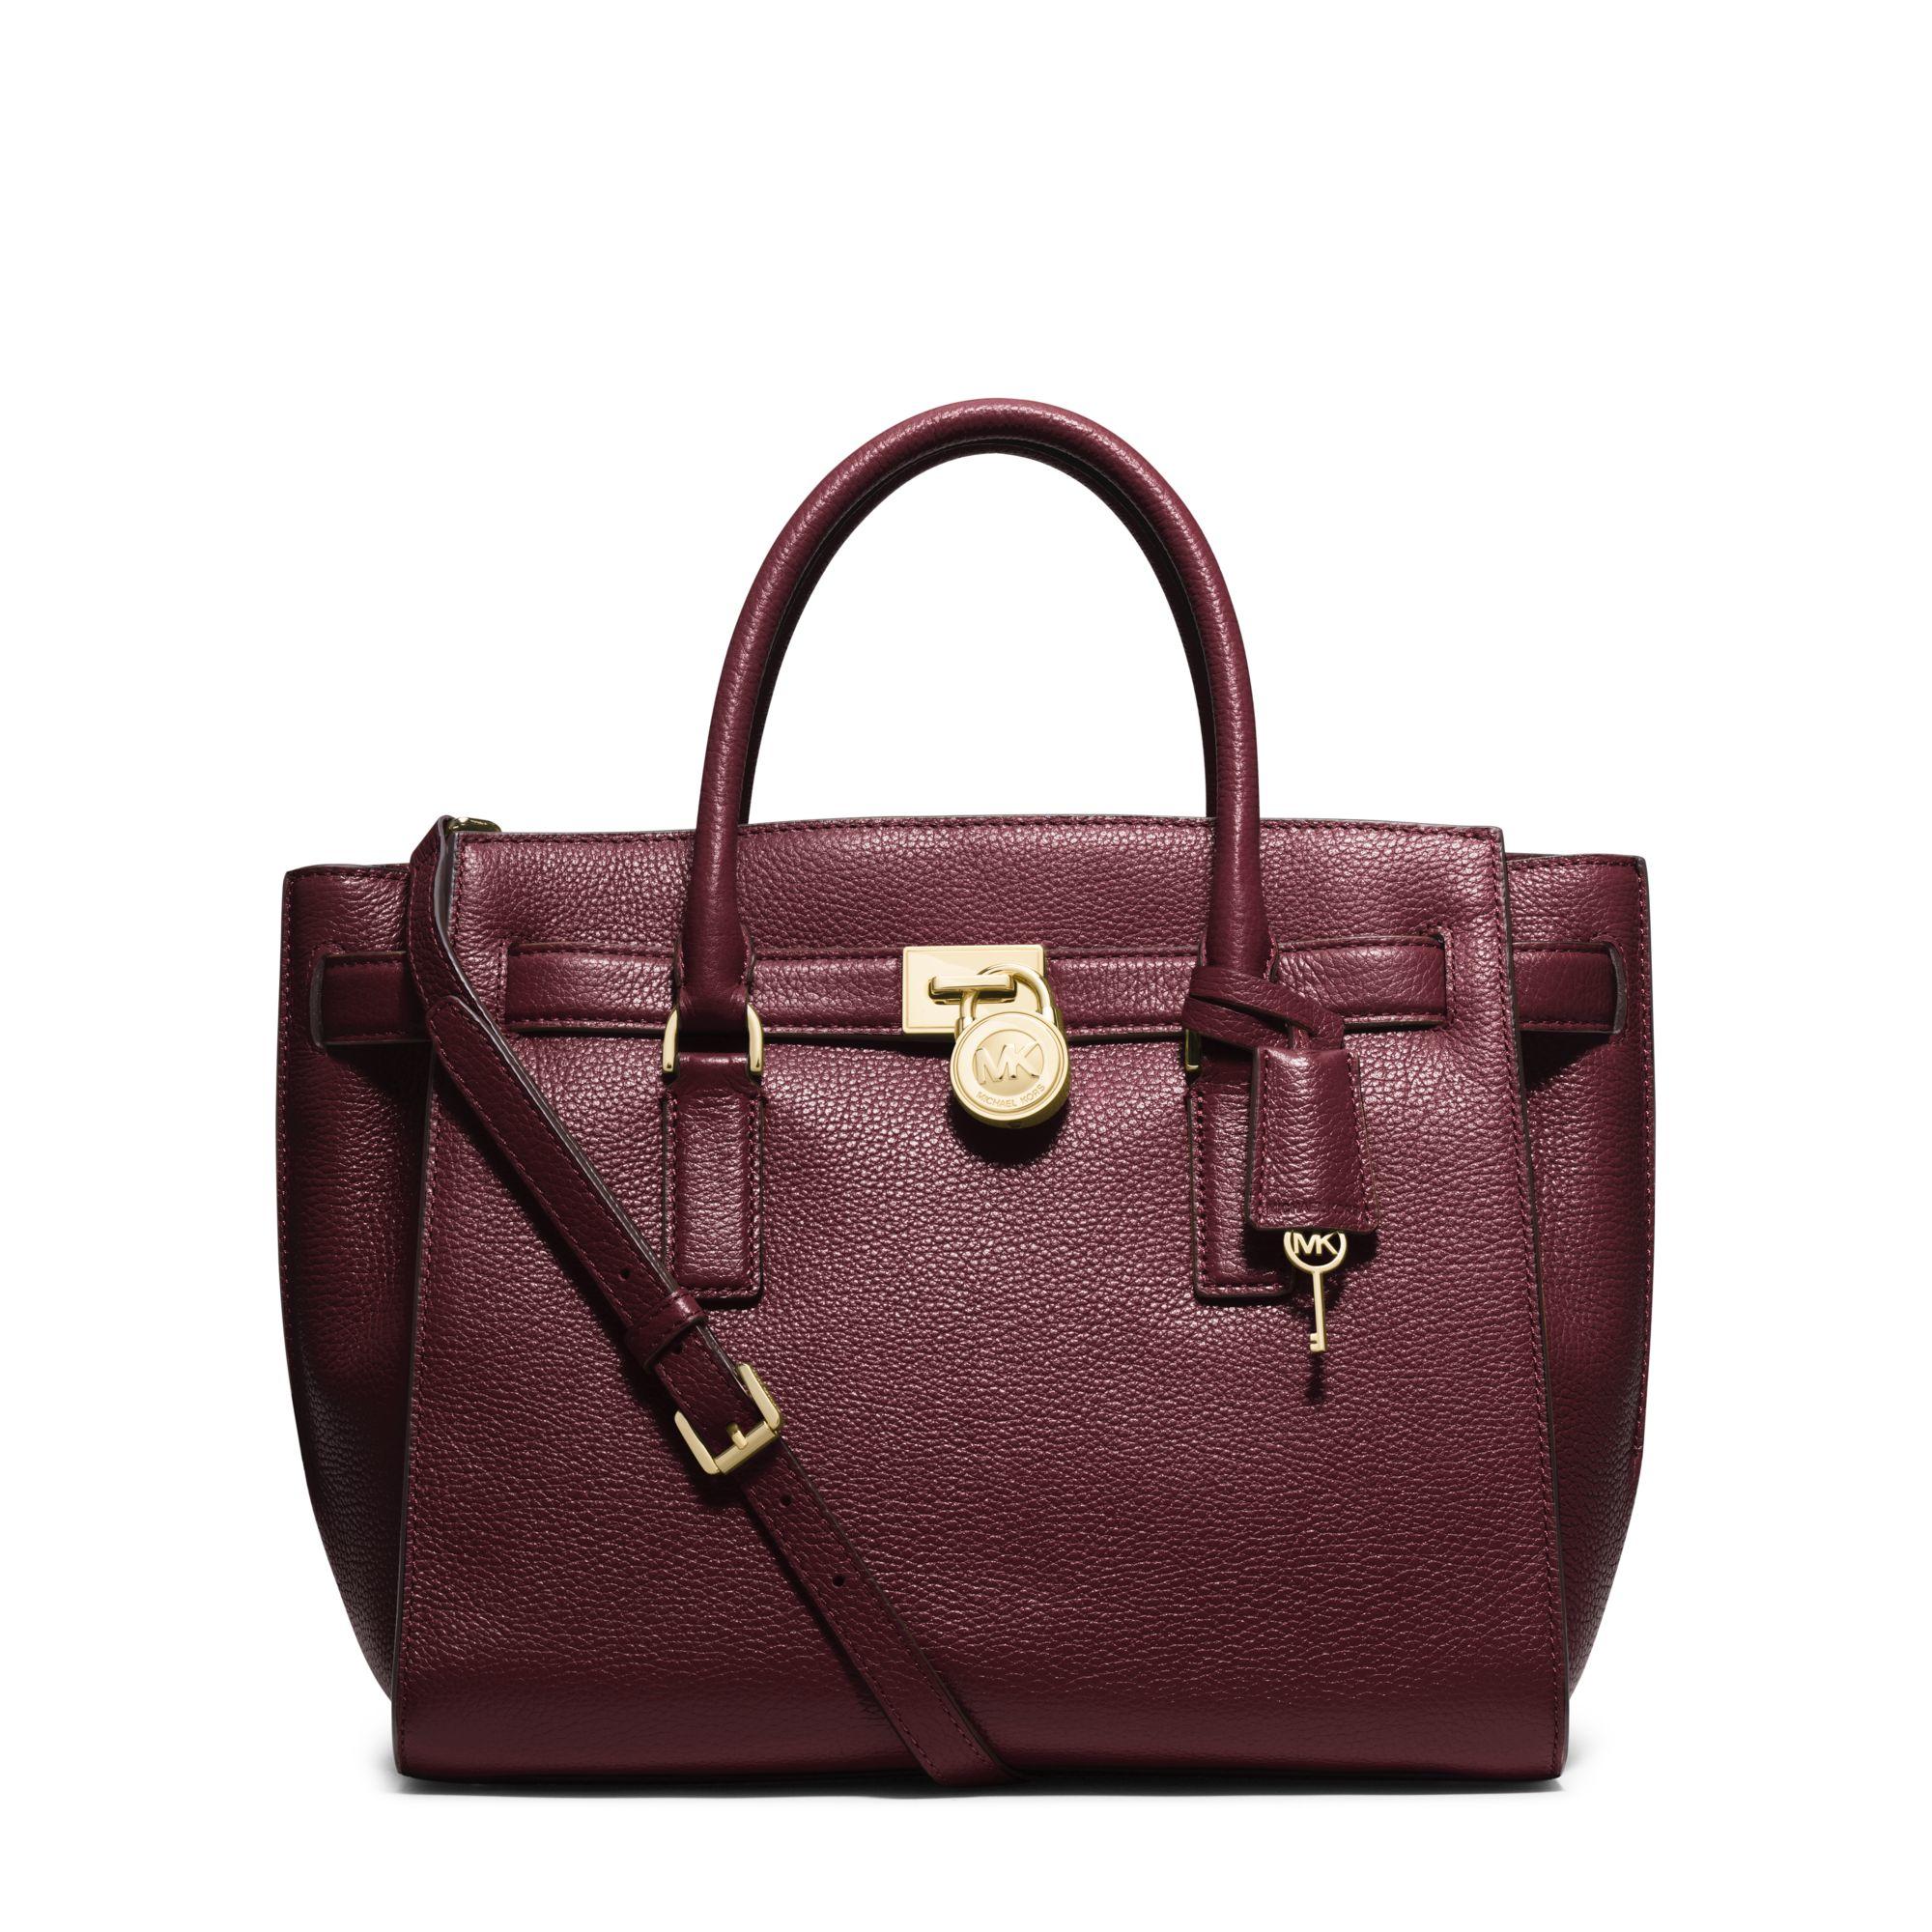 michael kors hamilton traveler leather satchel in purple